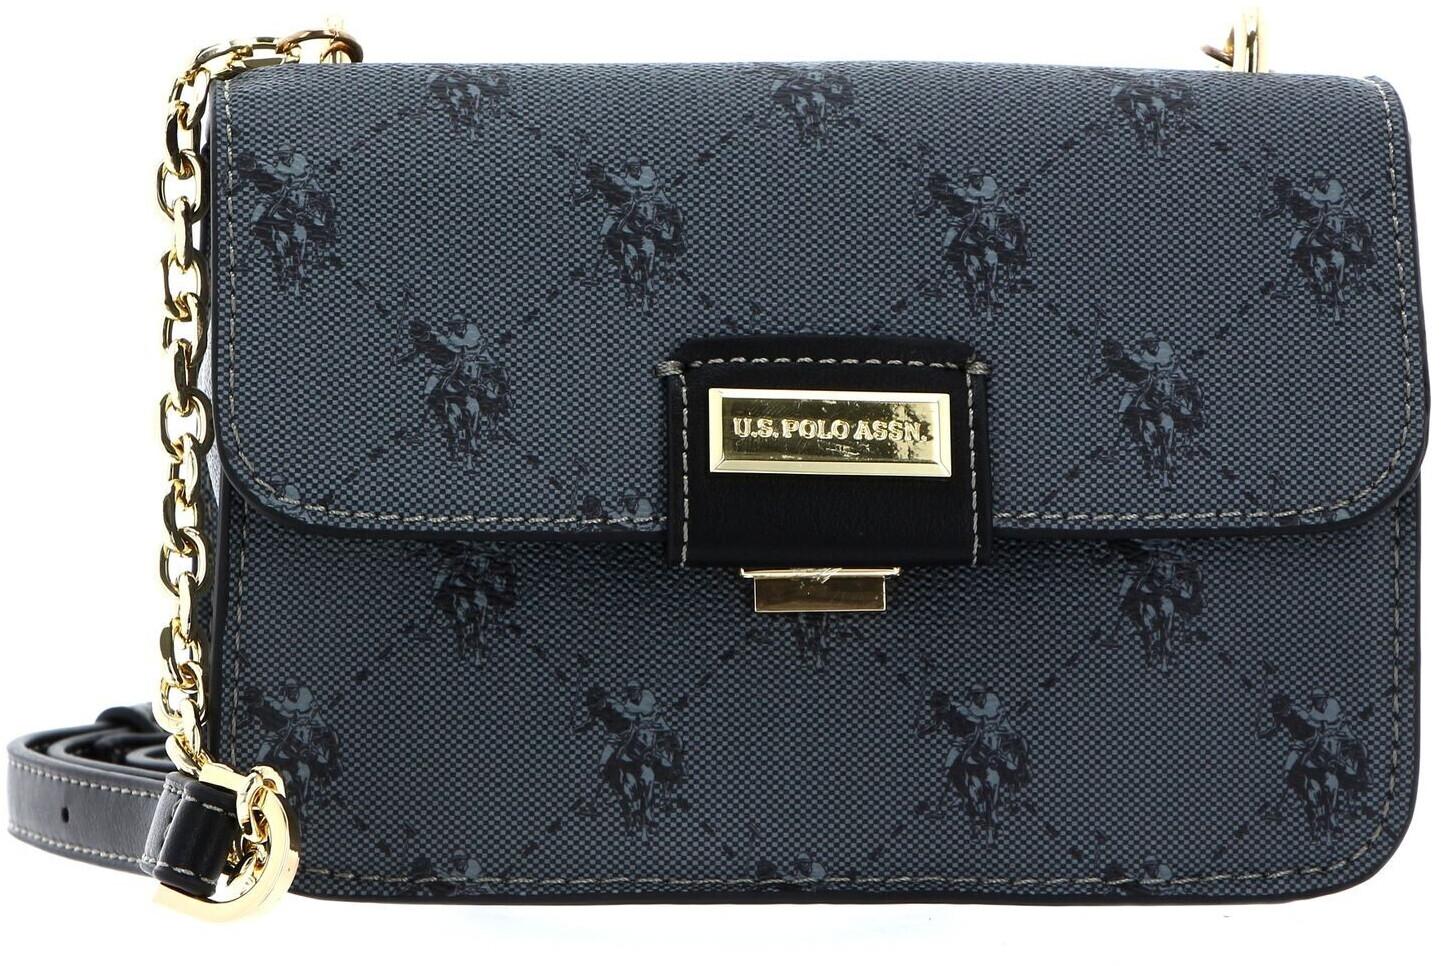 U.S. Polo Assn. Hampton Mini Flap Bag